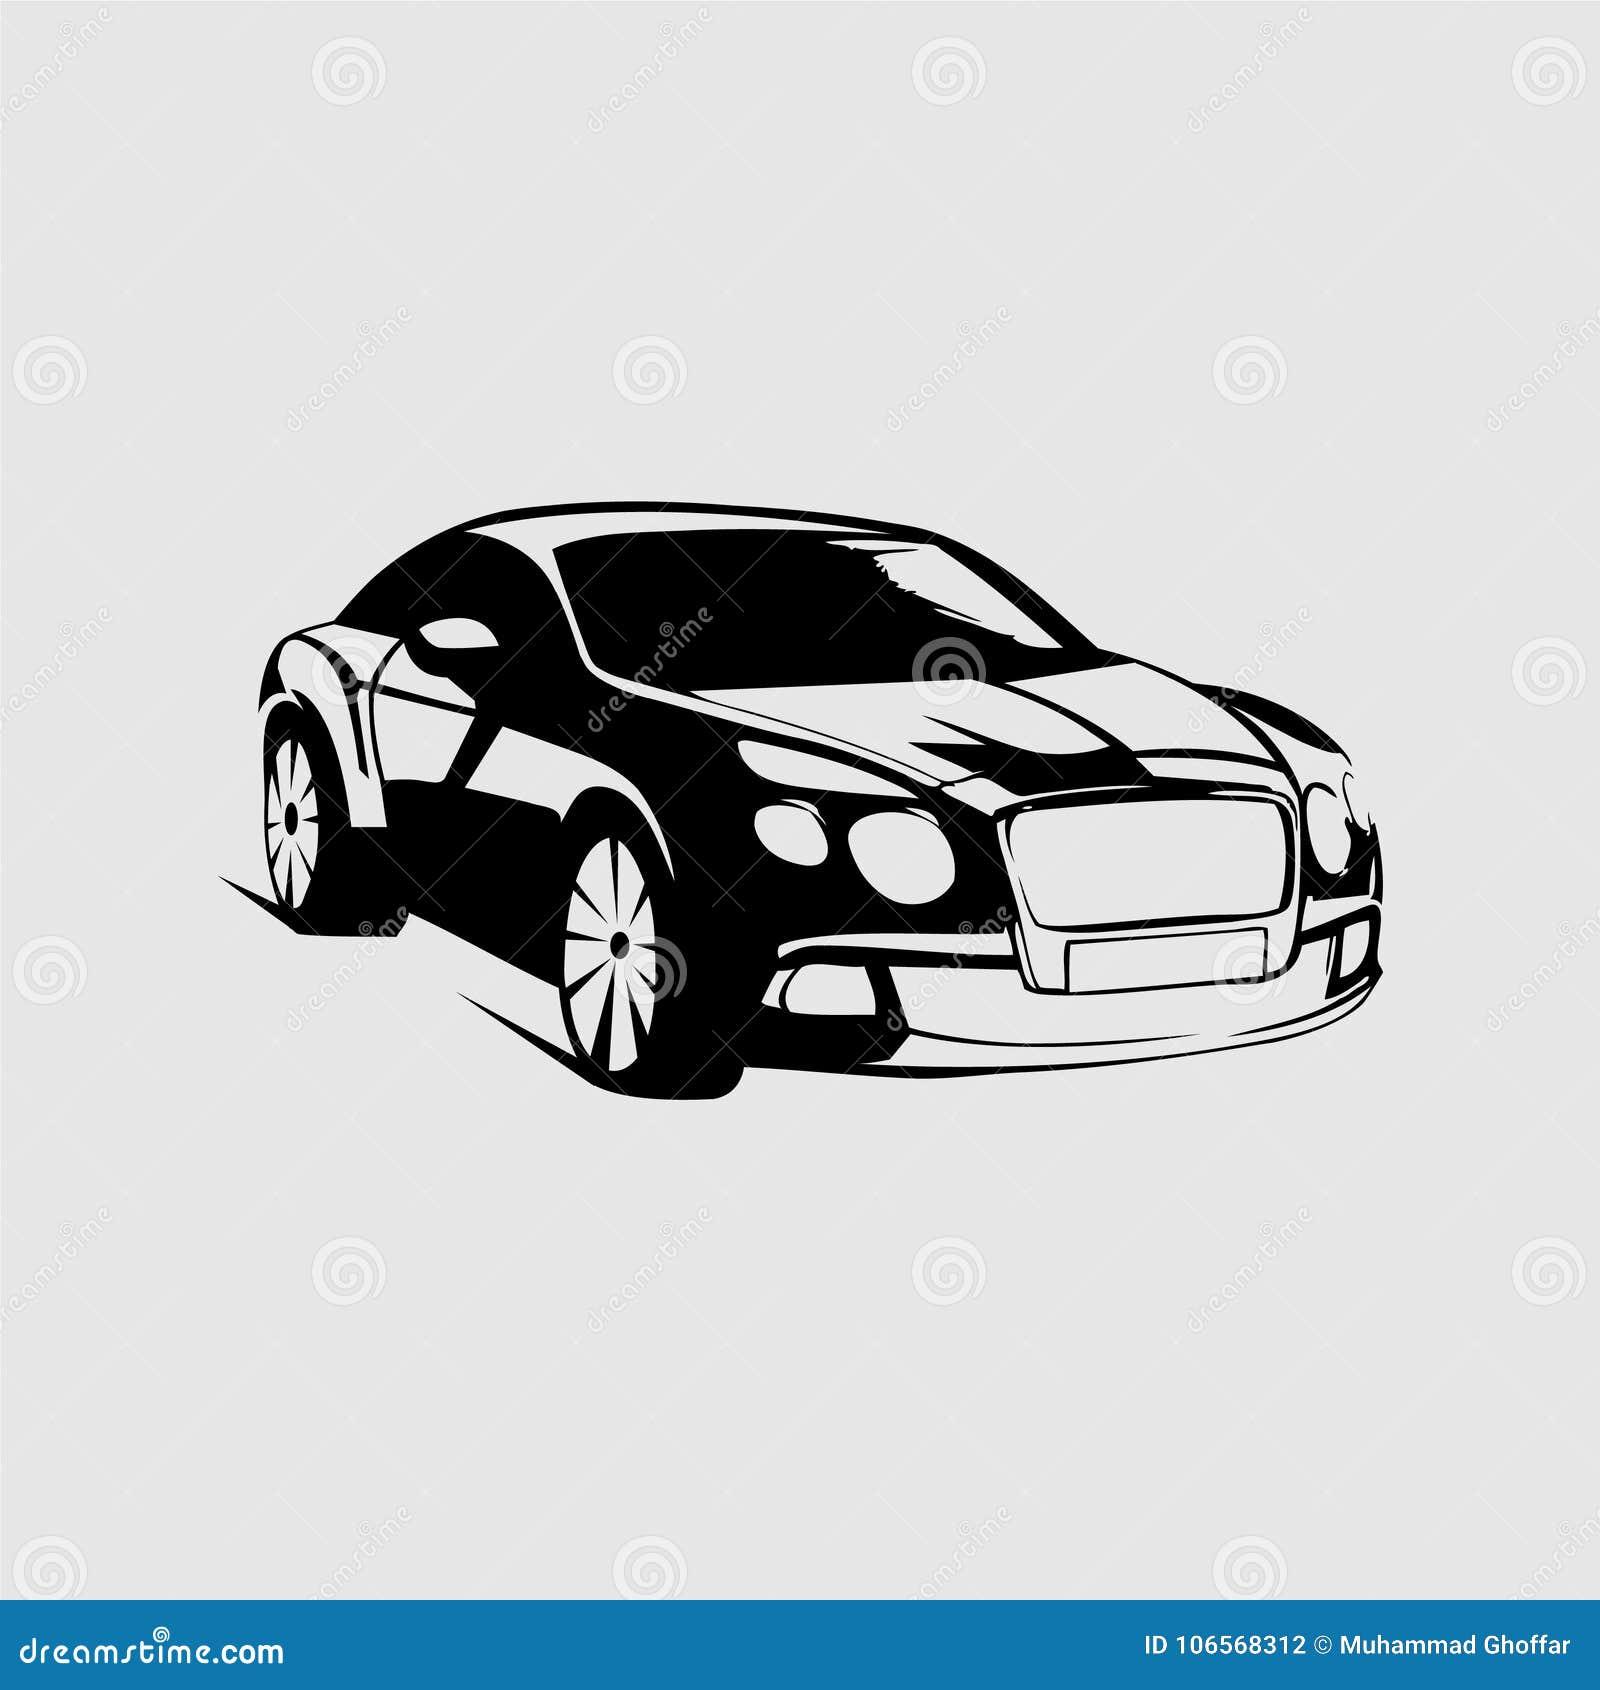 Car Icon Car Icon Vector Car Icon Object Car Icon Image Car Icon